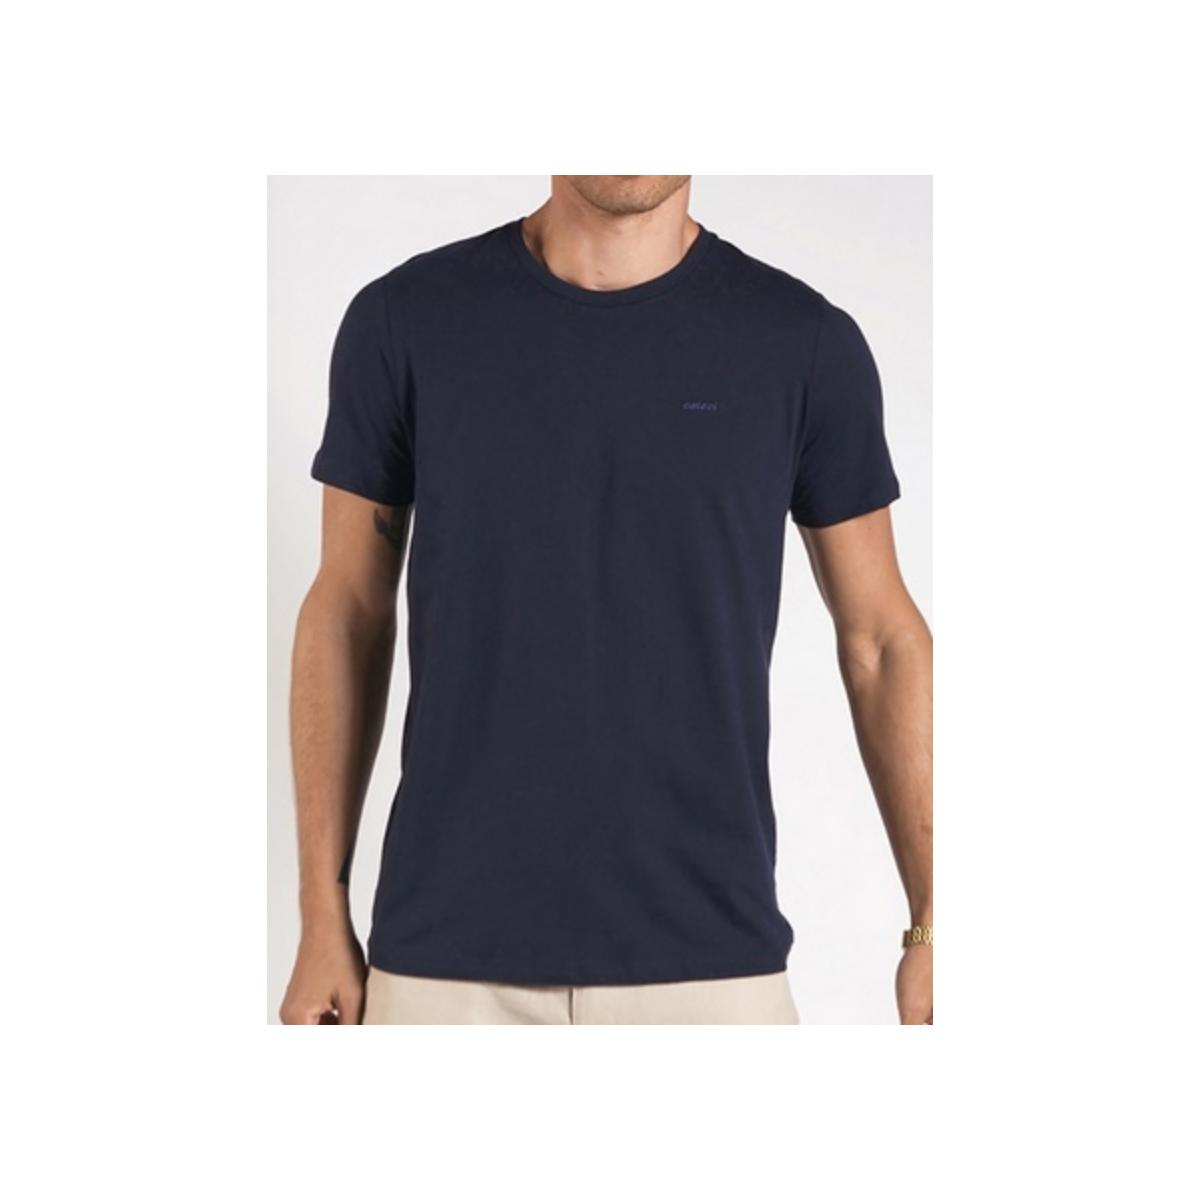 Camiseta Masculina Colcci 350107768 33664 Azul